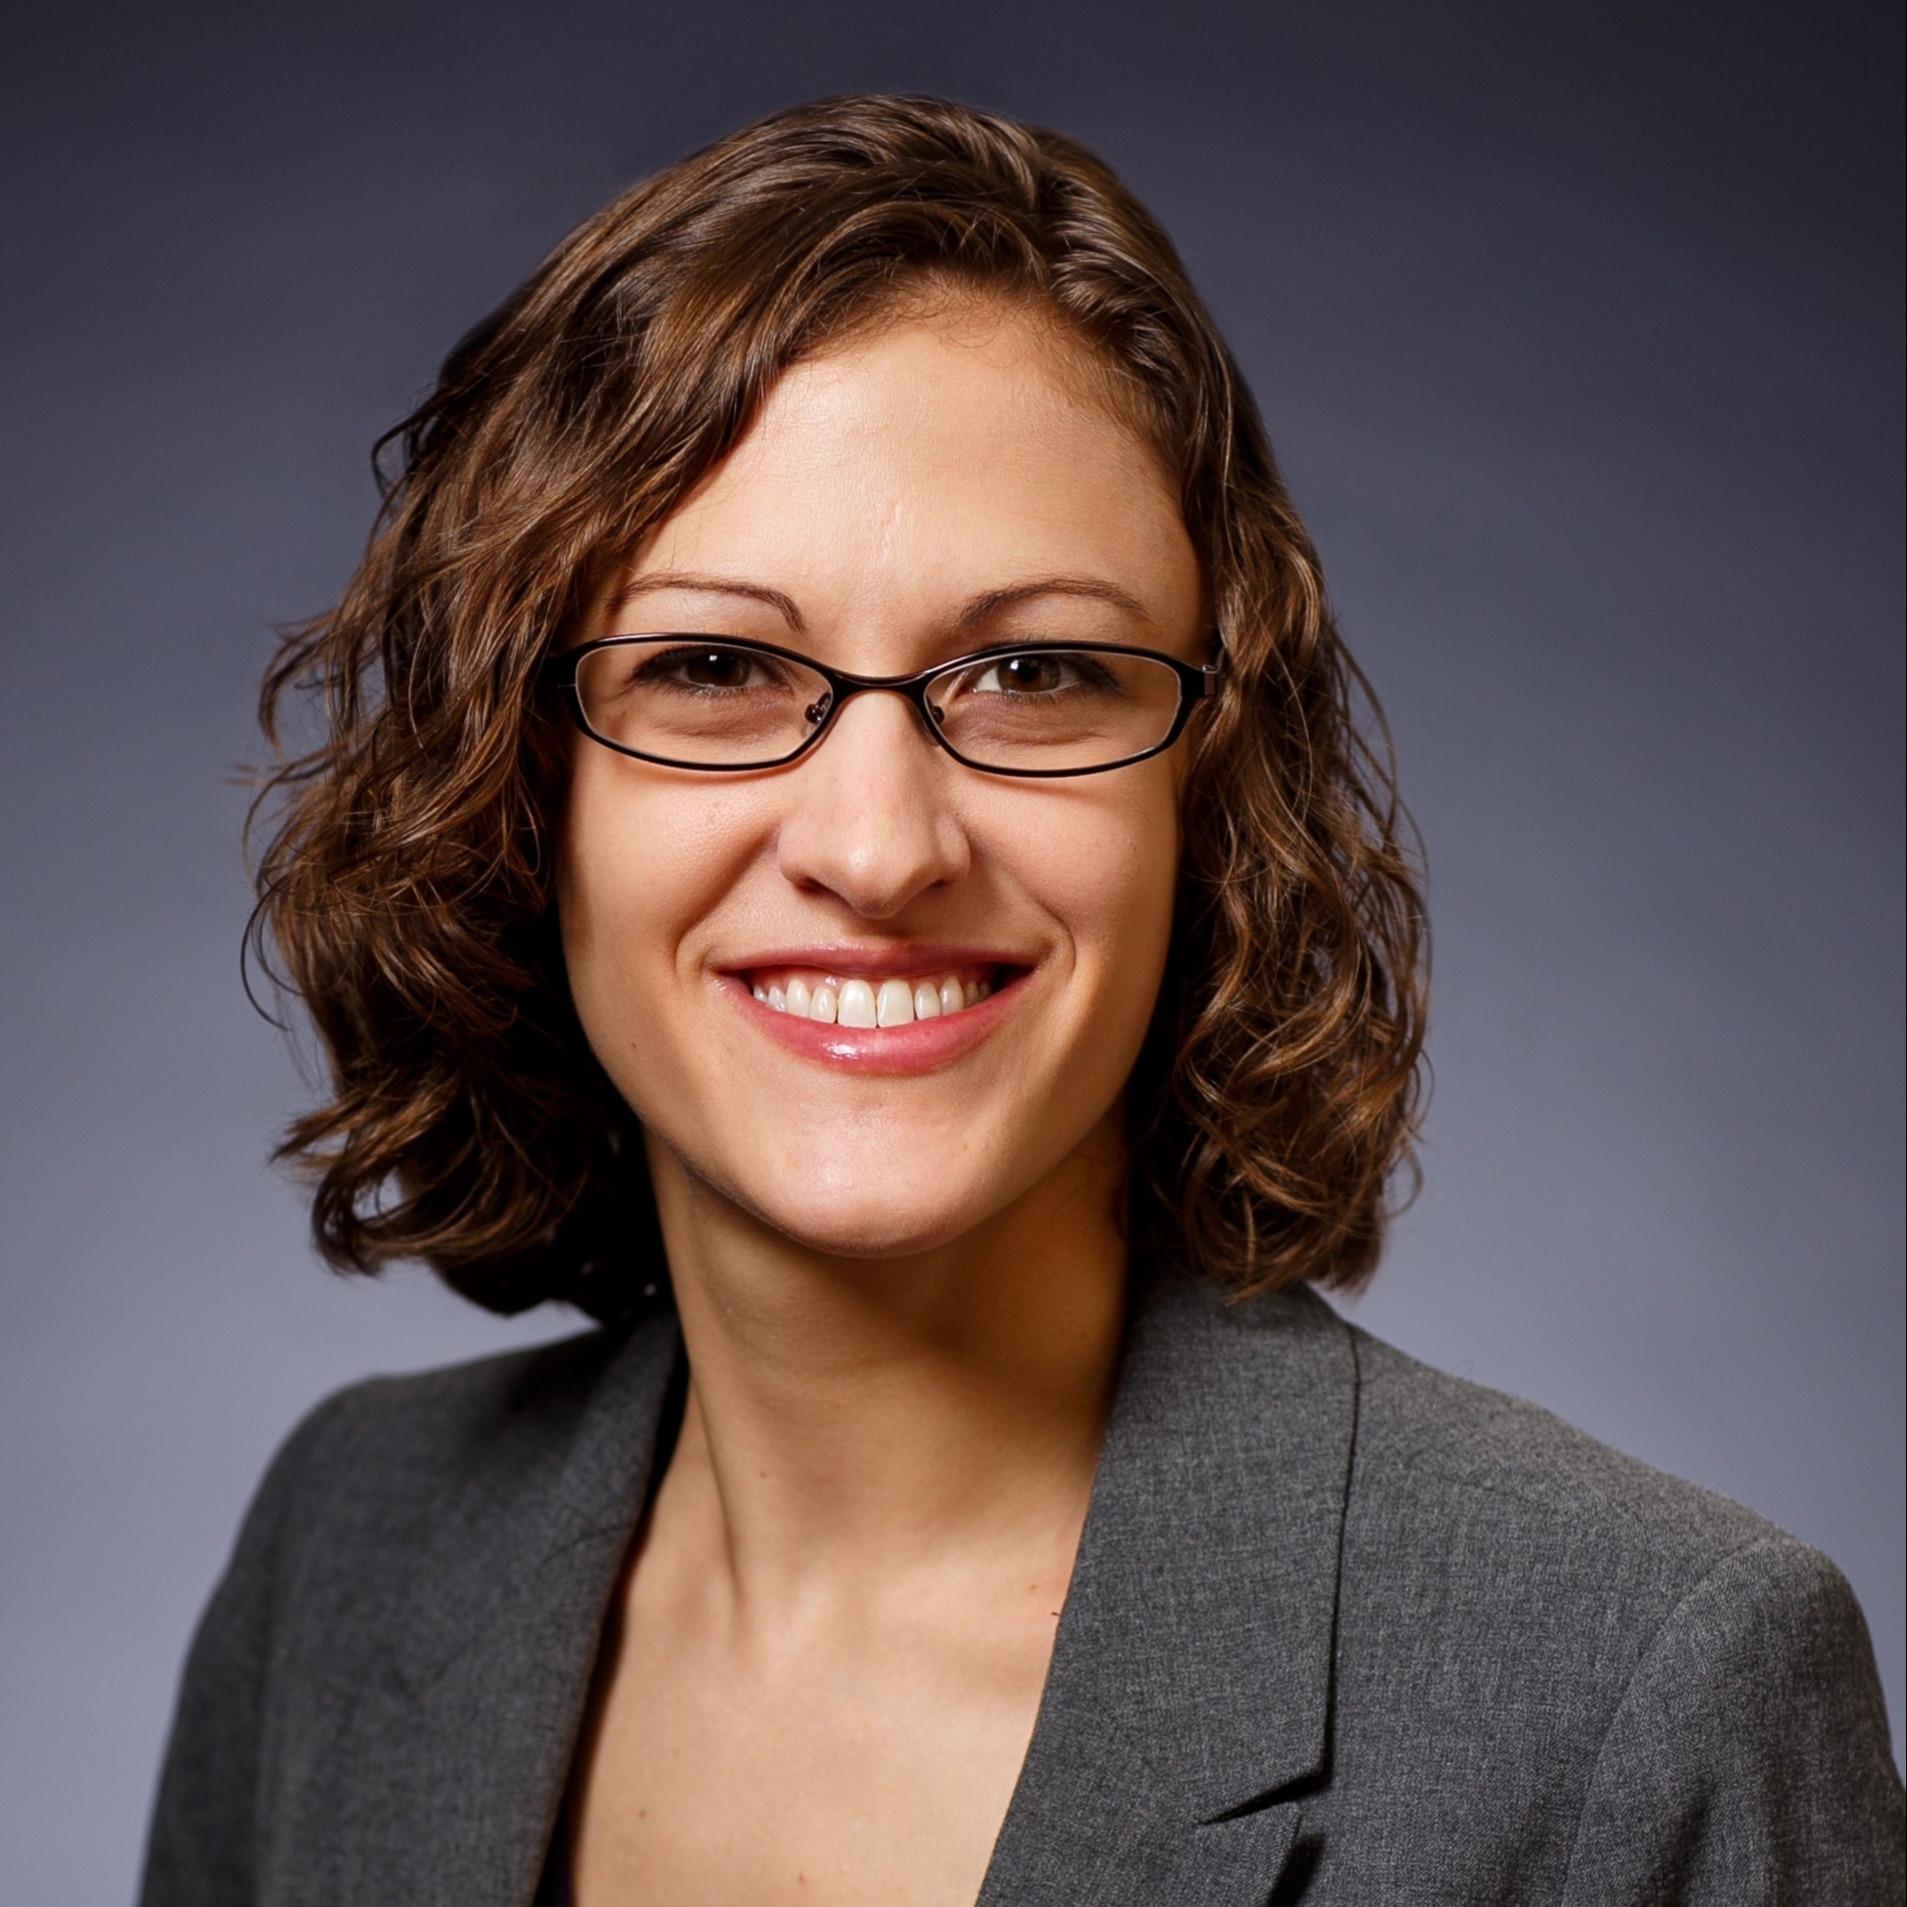 Trout CPA Partner, Karen Shenk, Earns CCIFP Designation